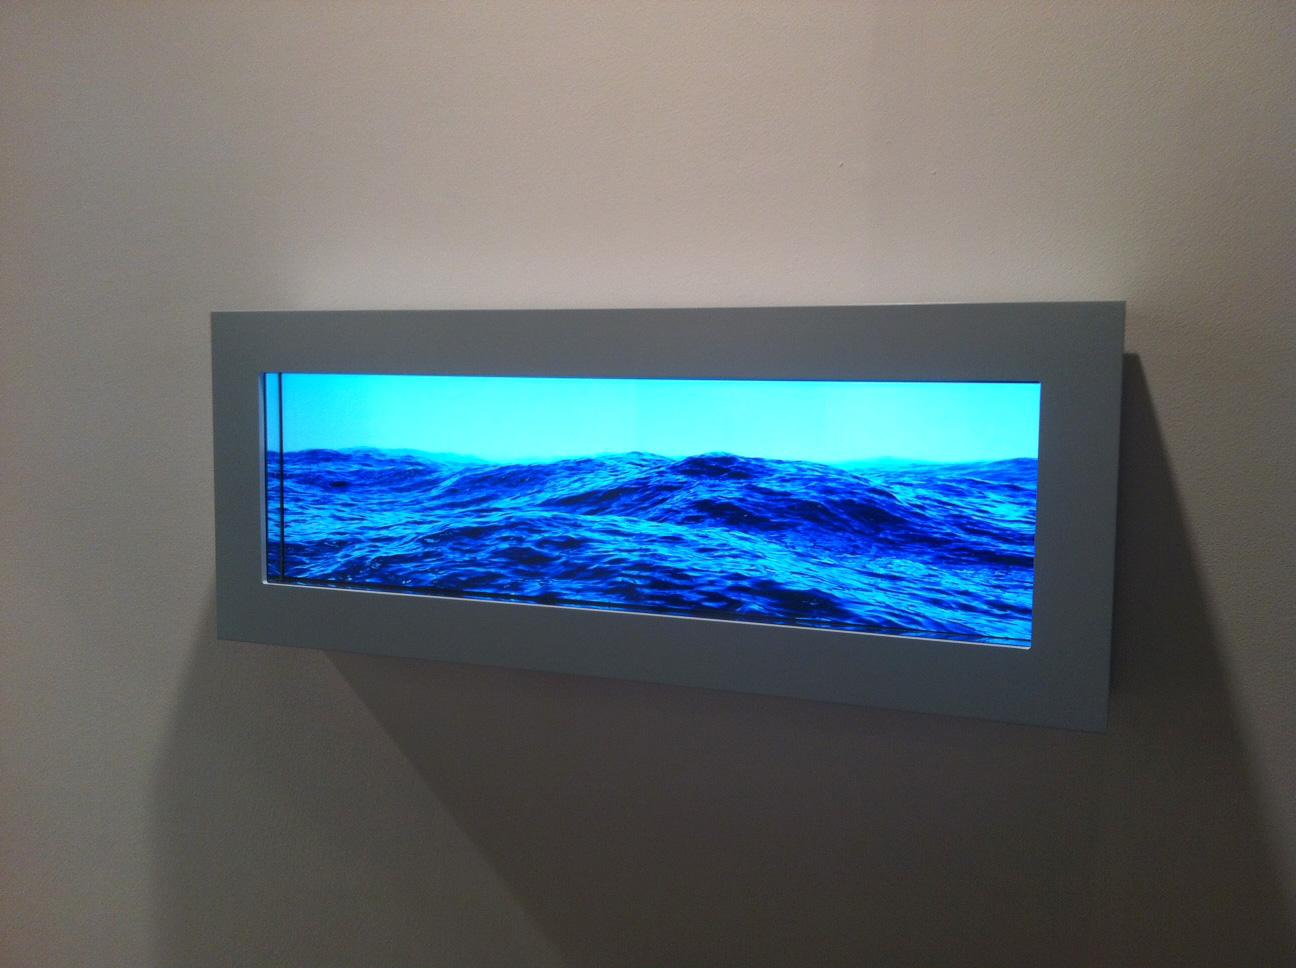 Art Dubai 2014,  Madinat Jumeirah, Dubai, United Arab Emirates. Booth A42, March 19 – 22, 2014